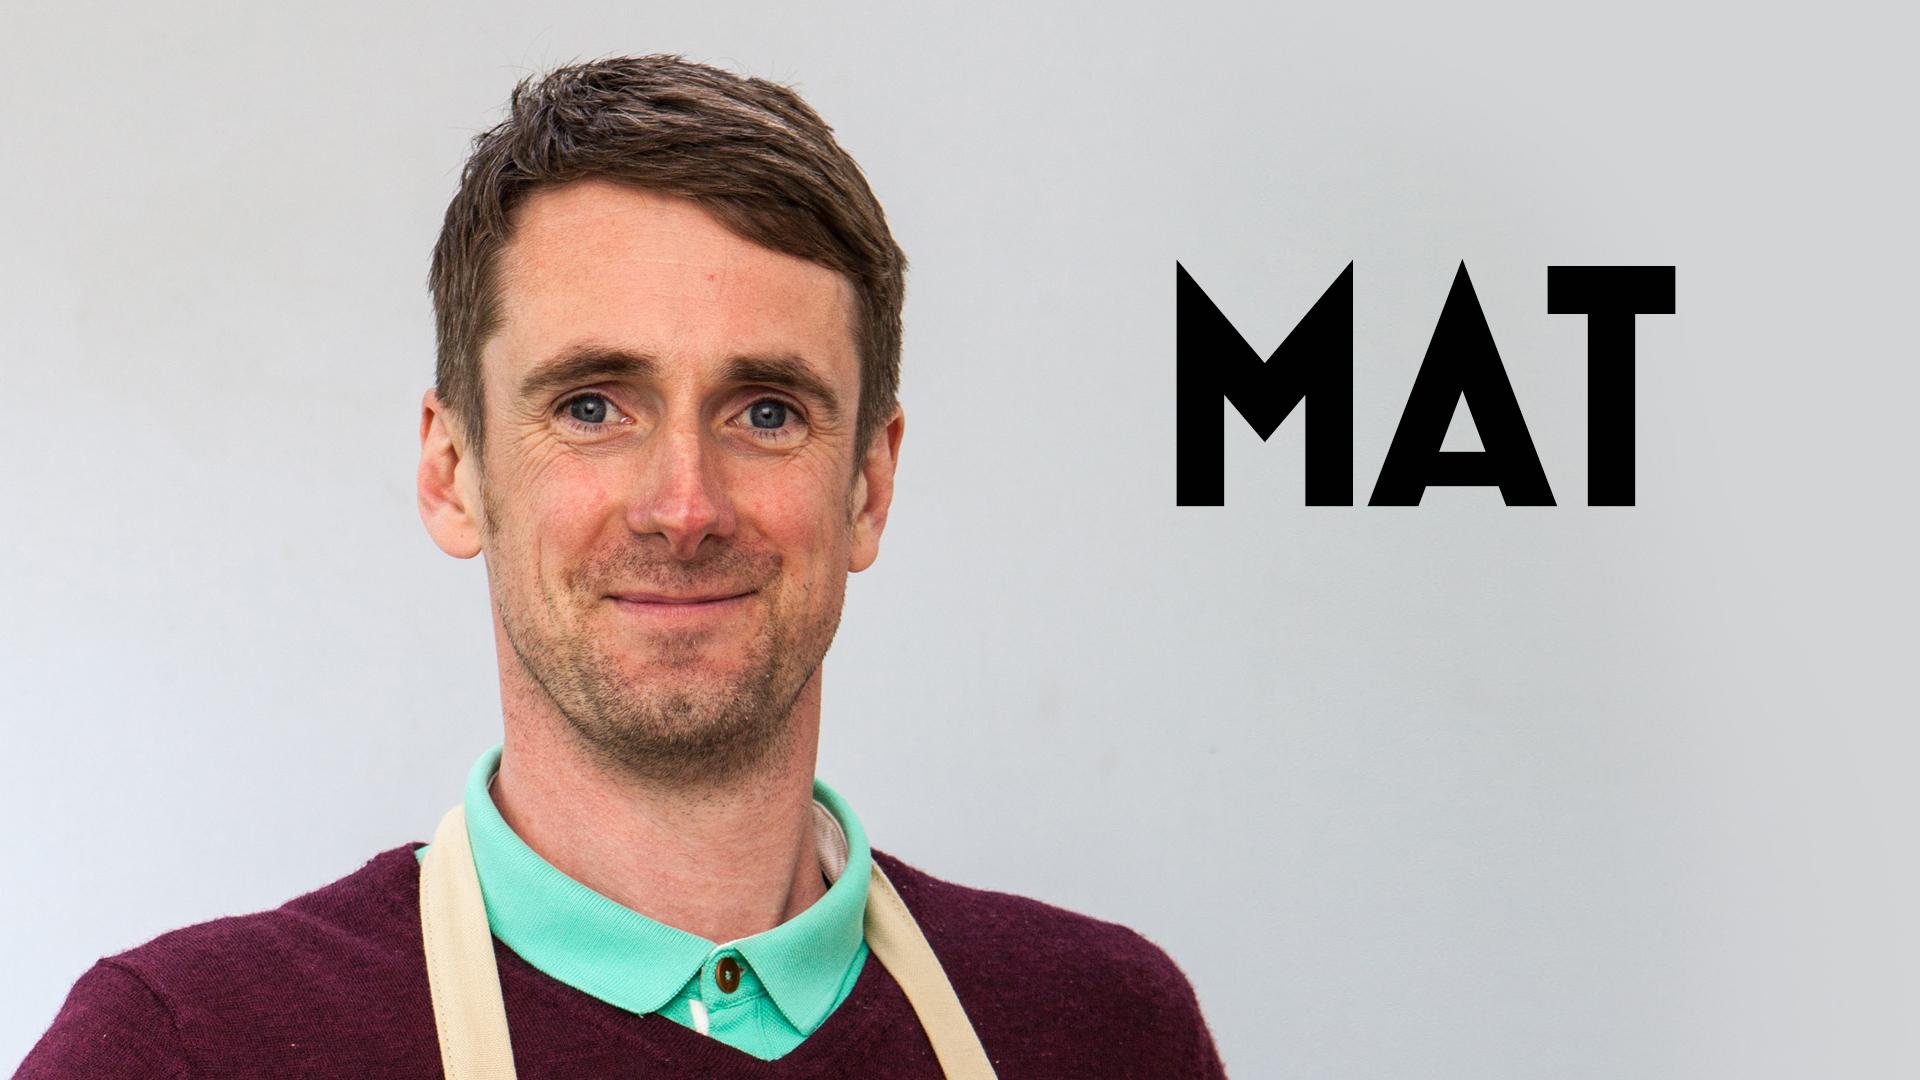 The Great British Baking Show - Mat